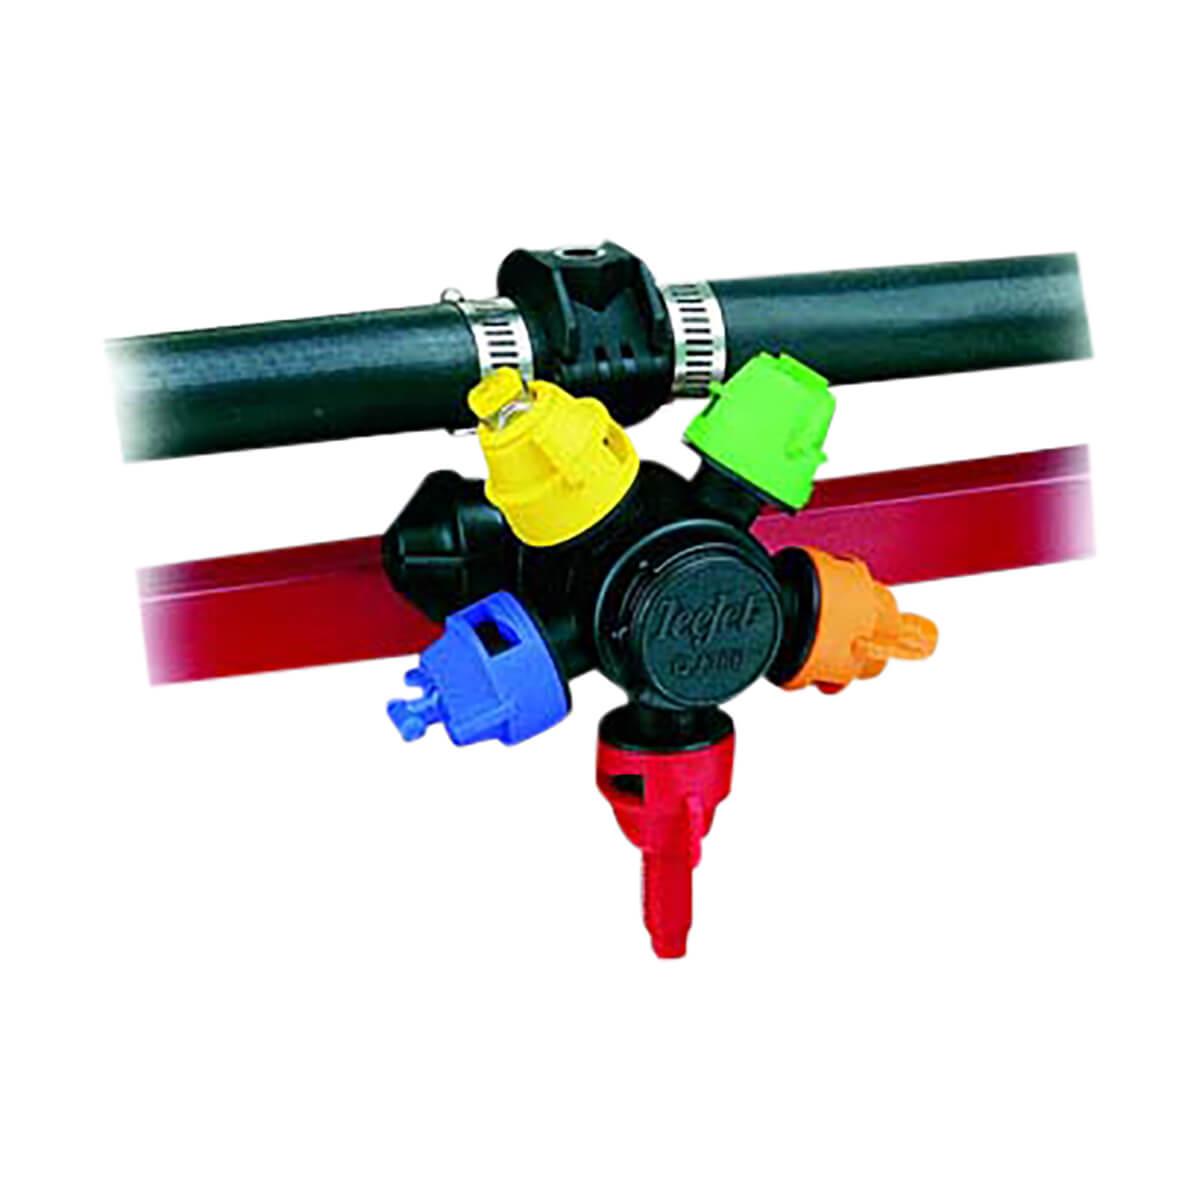 "Quick Teejet Nozzle Body for Wet Booms, 5 Nozzles - 3/4"""